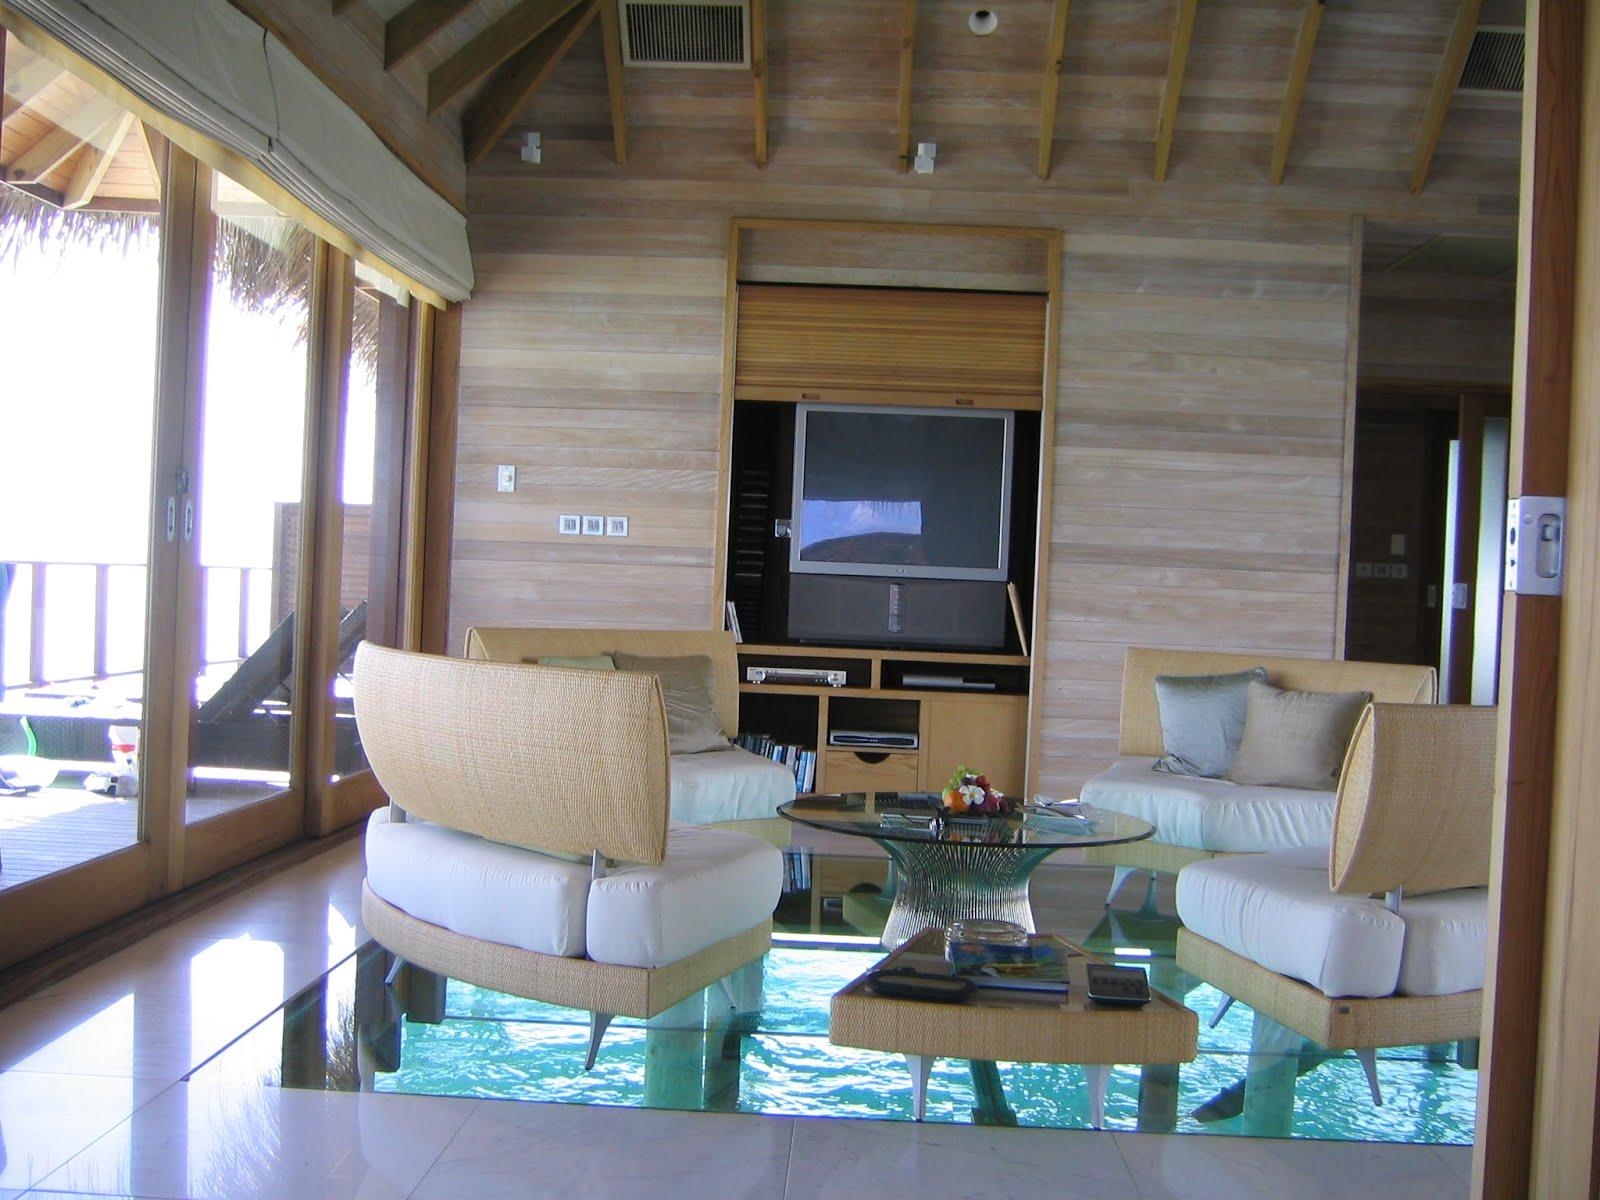 Island MED Villa og ANSATTE kvartalene - Maldivene, Asia - Private Islands TIL Salgs